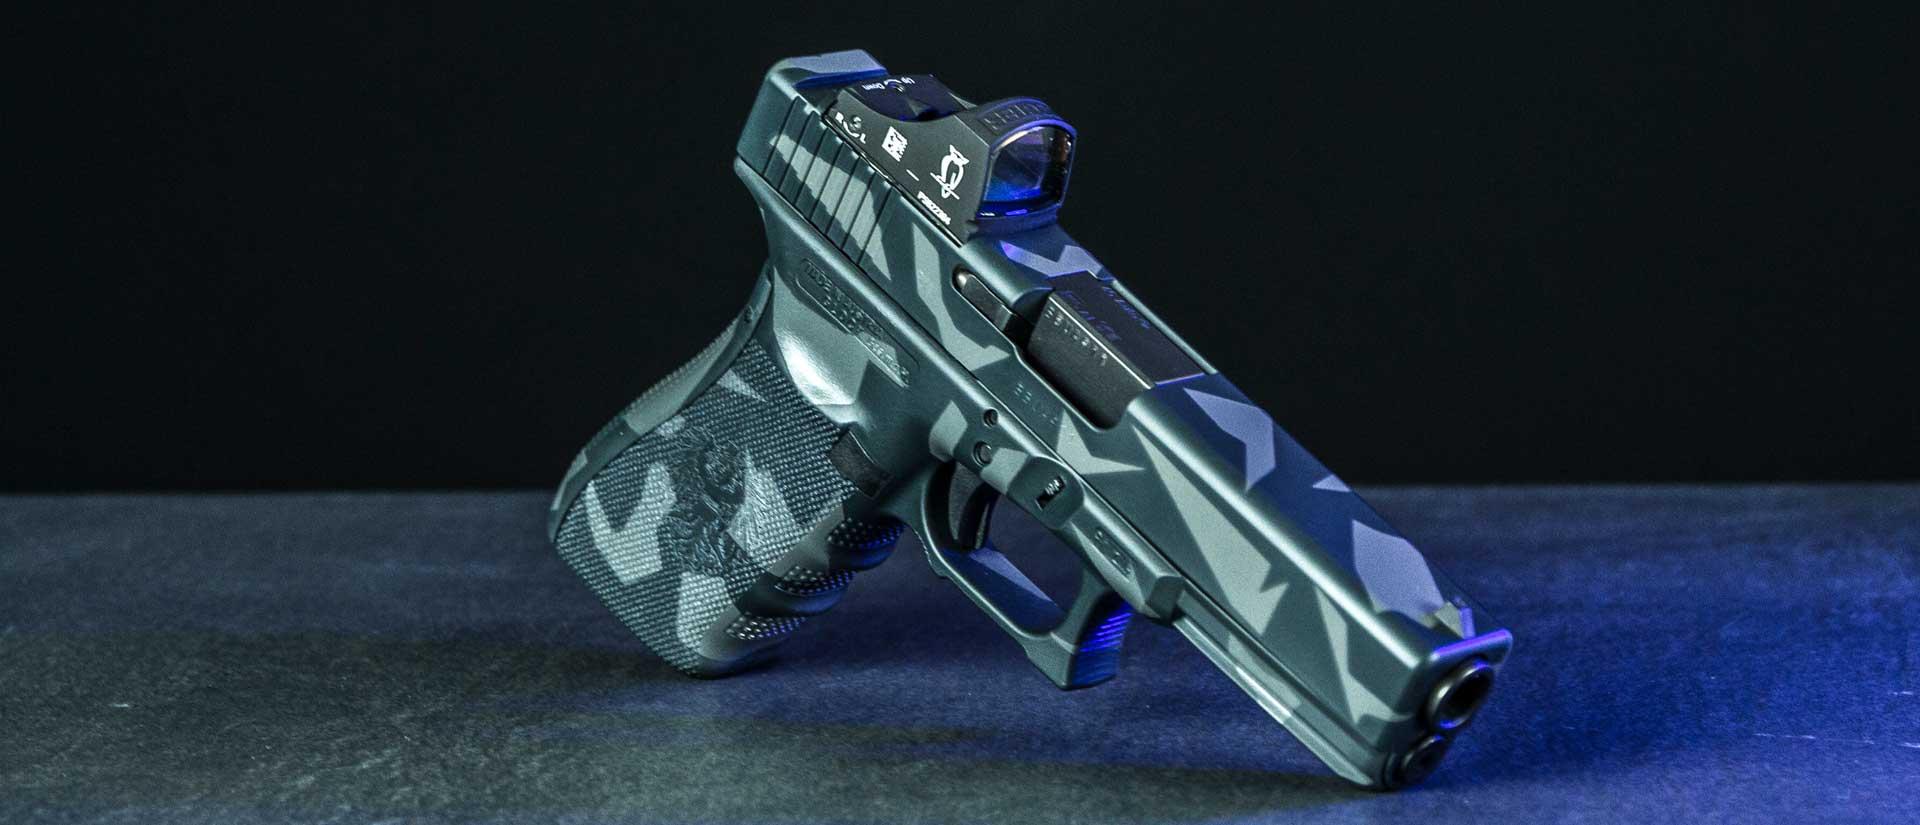 verex-tactical-tuning-waffen-pistole-glock-sig-sauer-17-cz-walther-visier-bruenieren-ar15-red-dot-beschichtung-tuning-cerakote-stippling-griptech-salzburg-slider-09